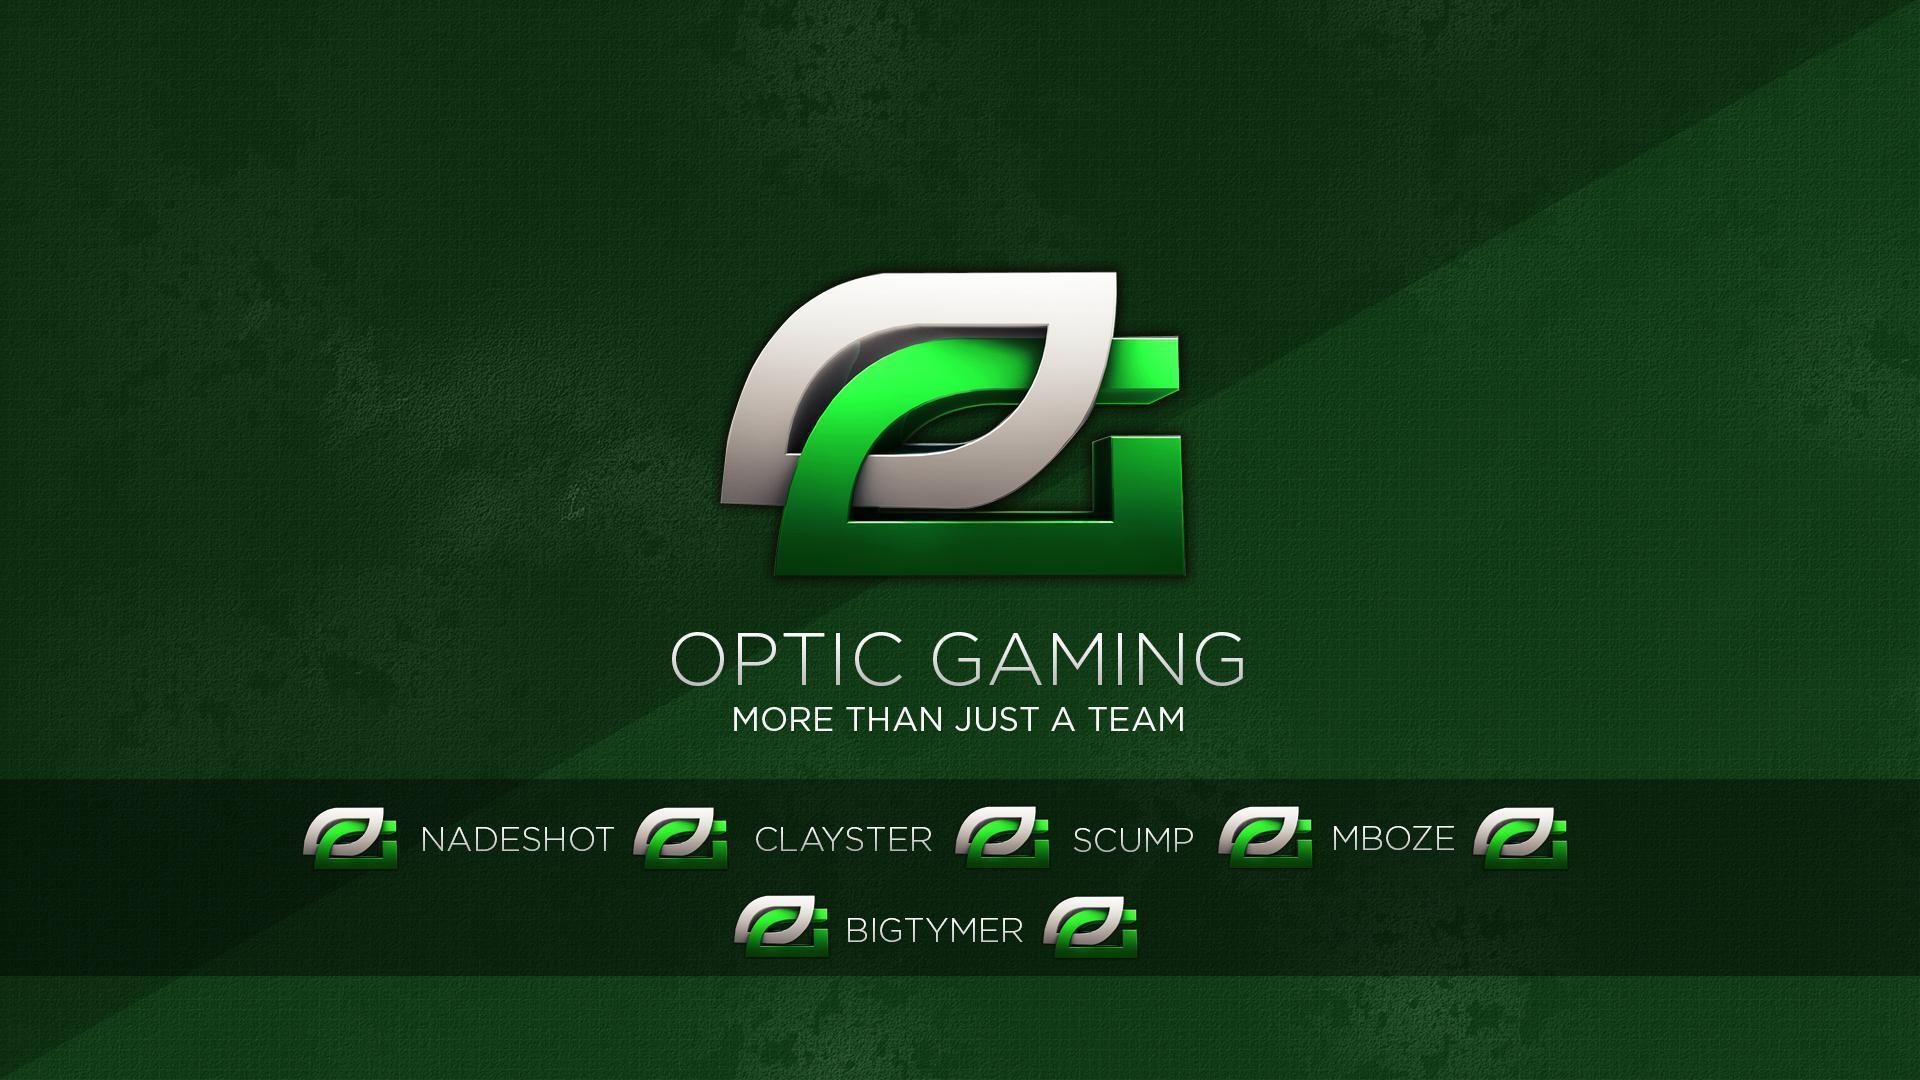 optic gaming wallpaper6 - photo #17